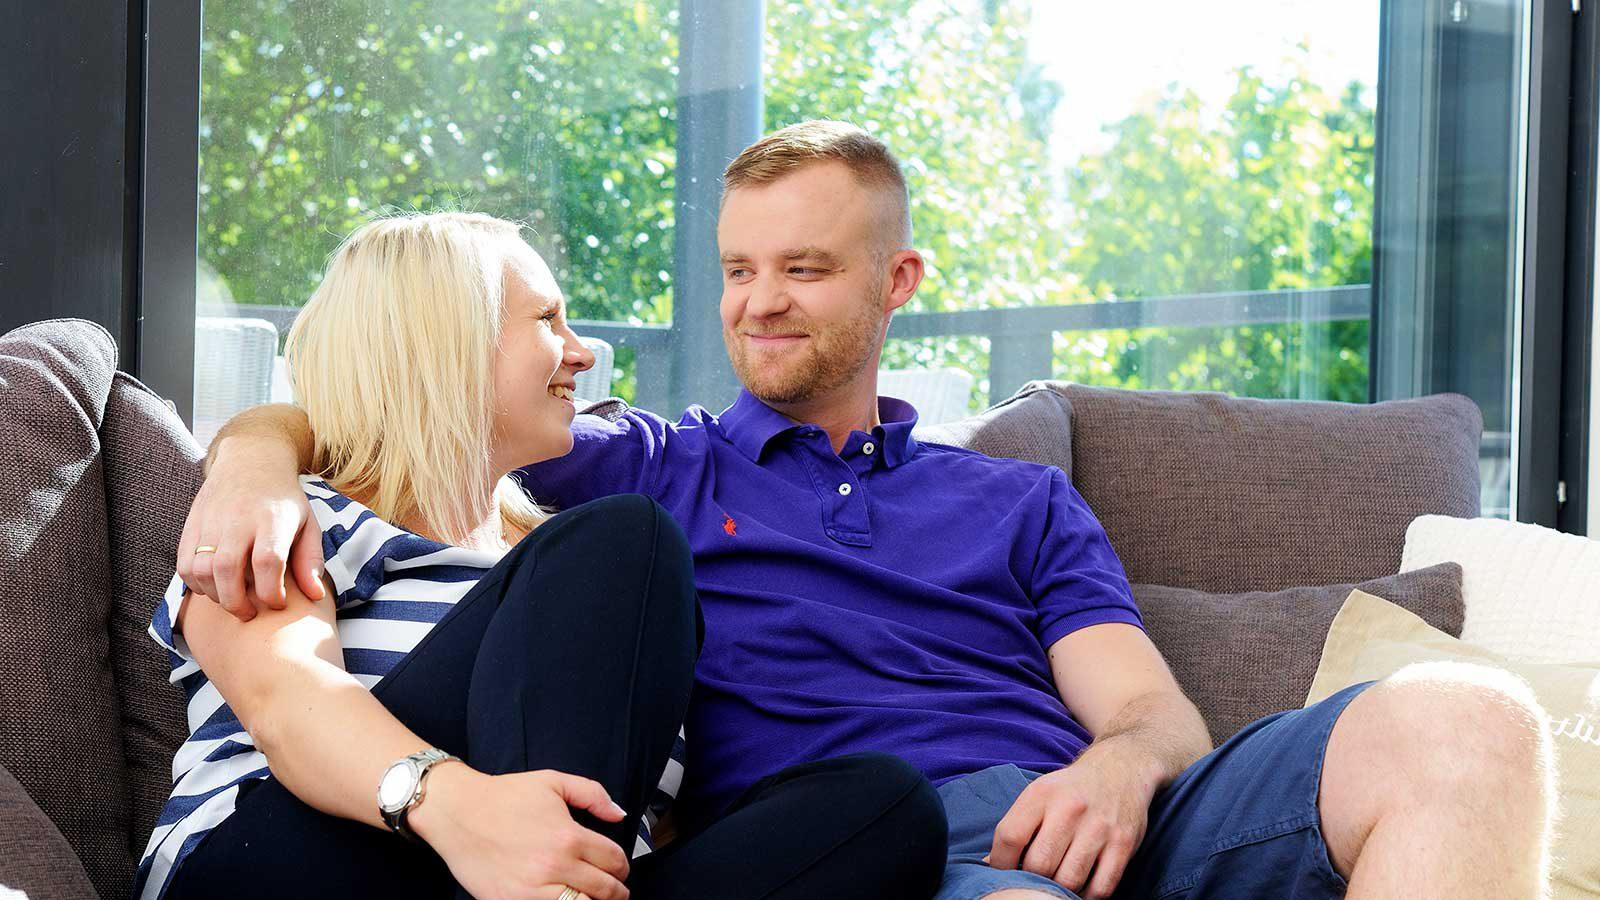 parhaat linjat dating hulluin dating profiilit